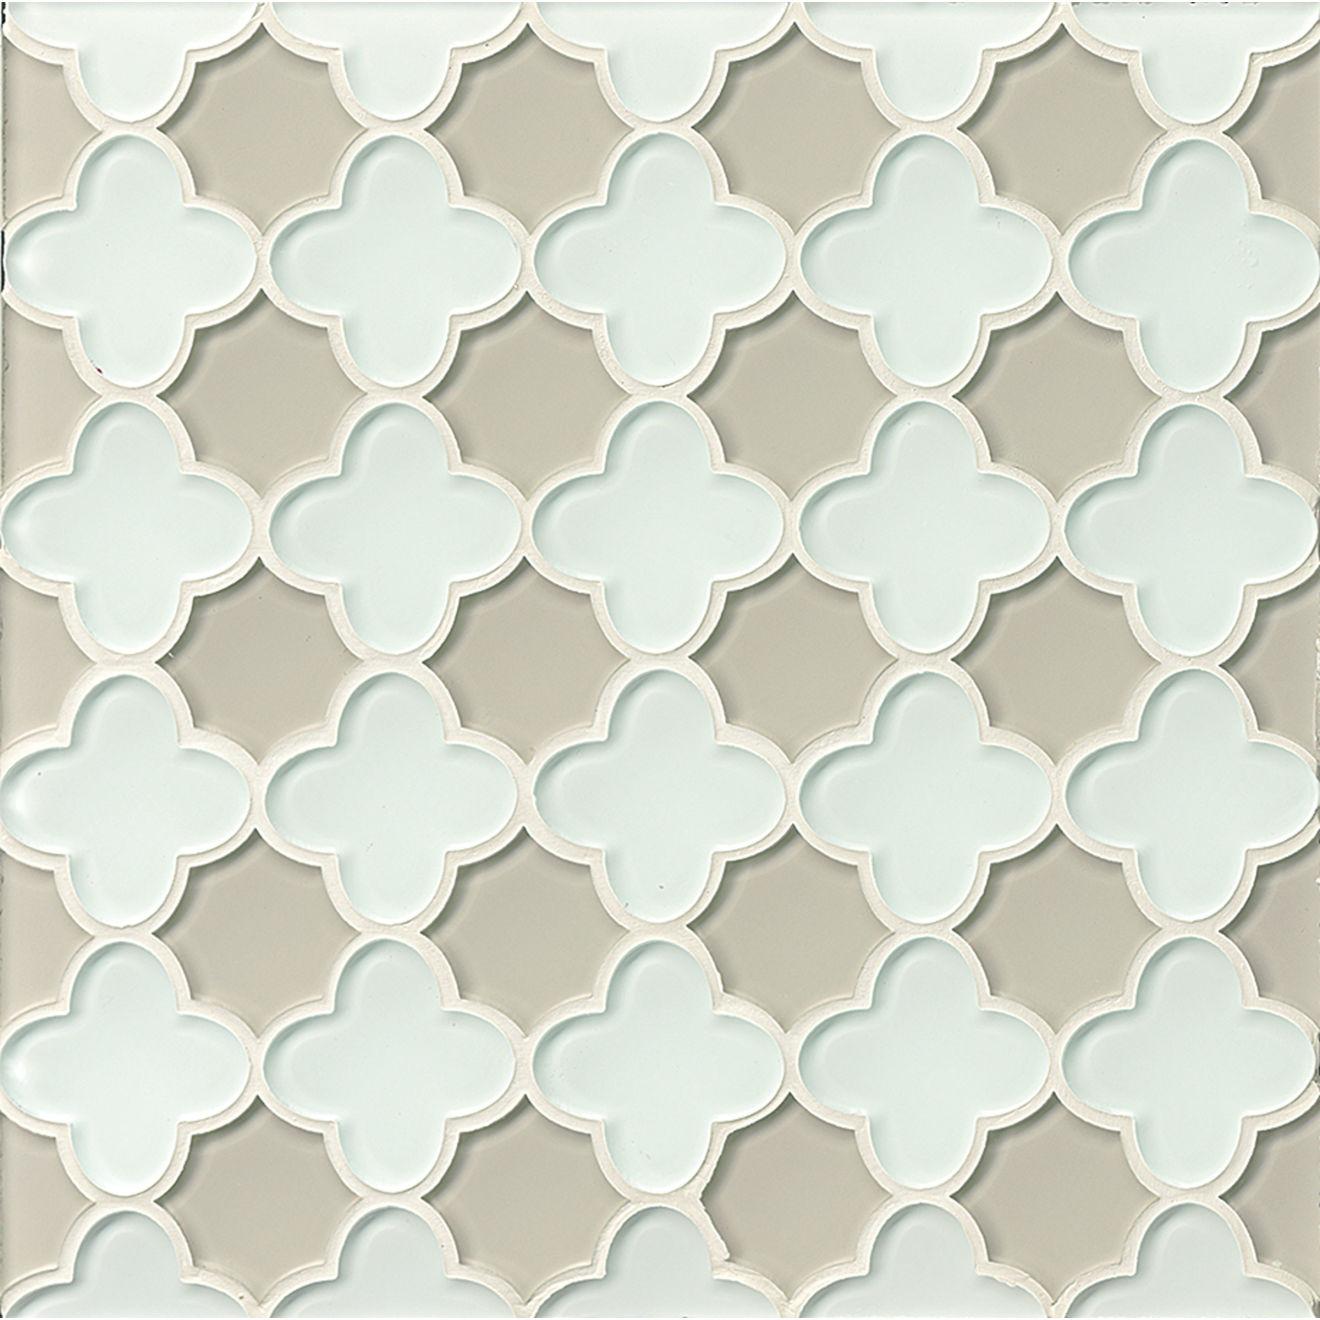 Mallorca Glass Wall Mosaic in White Linen / Mist